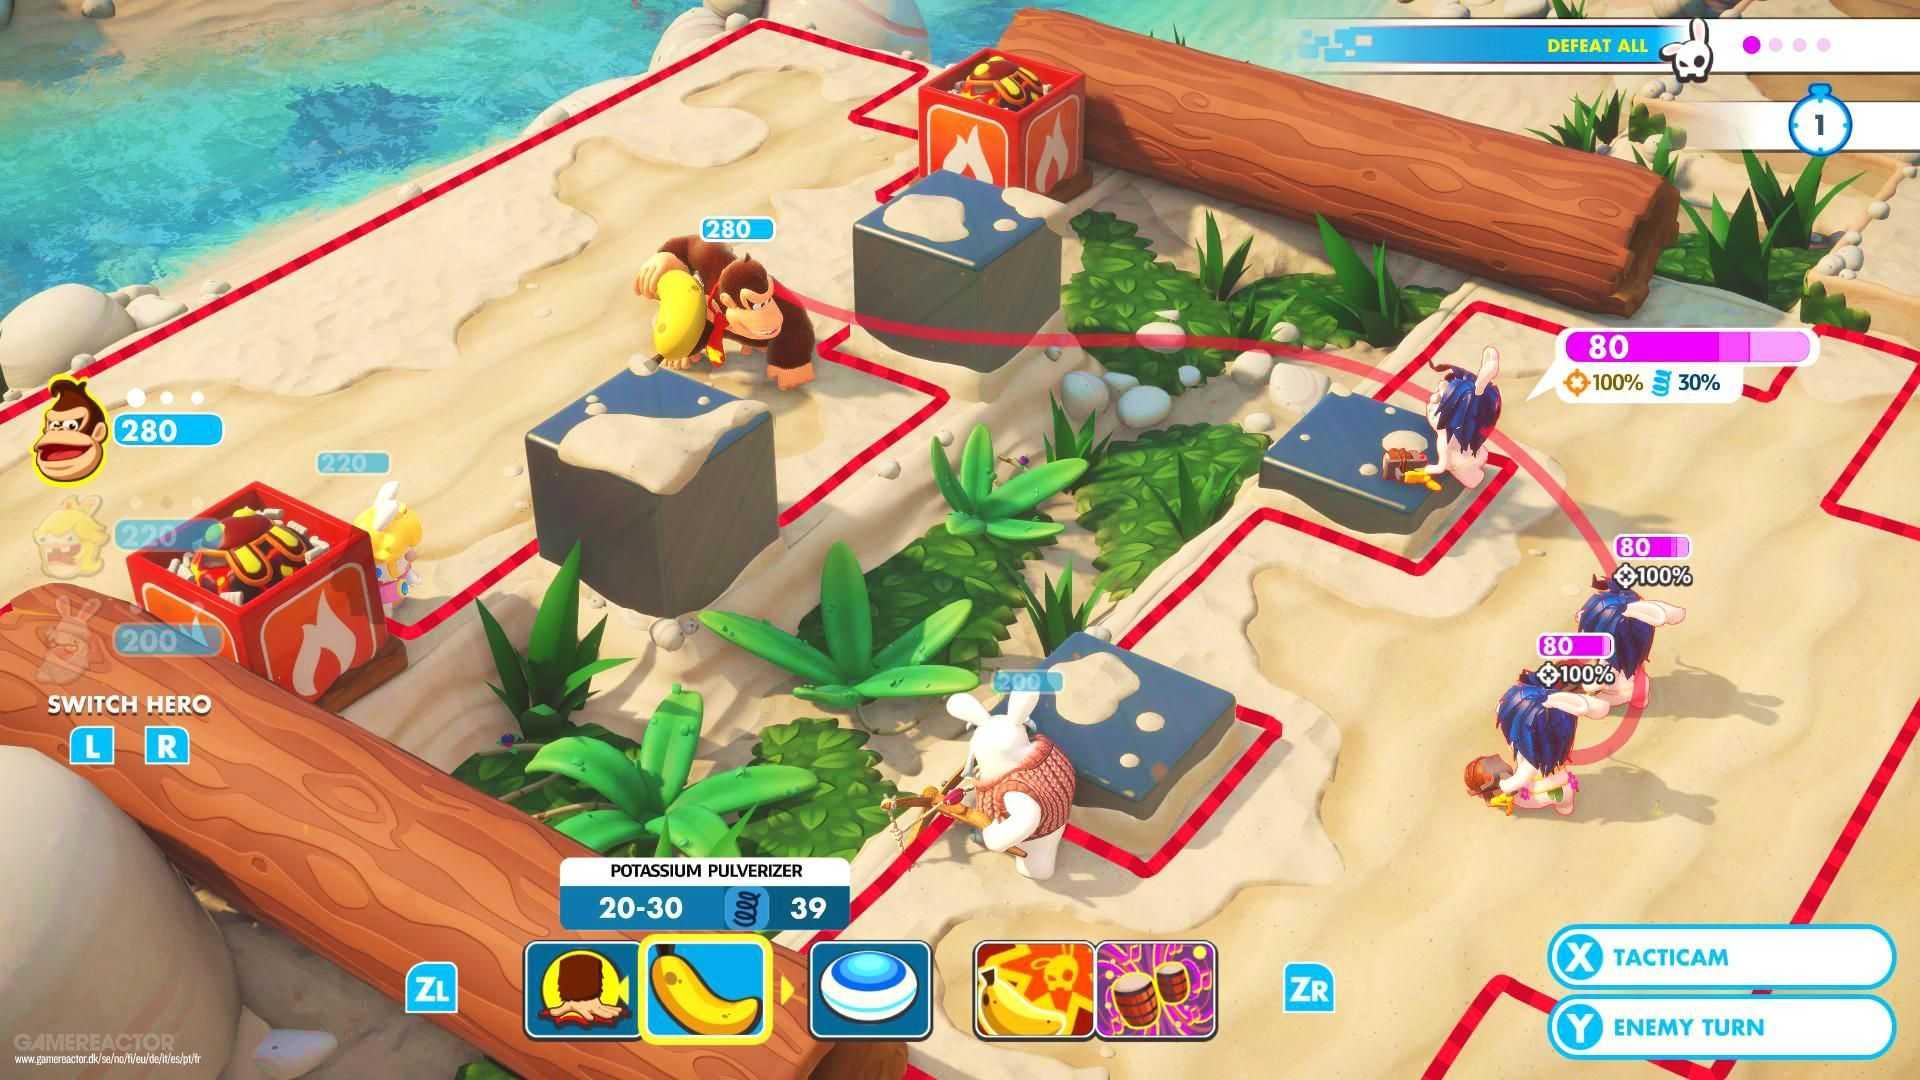 Mario + Rabbids Kingdom Battle Donkey Kong Adventure